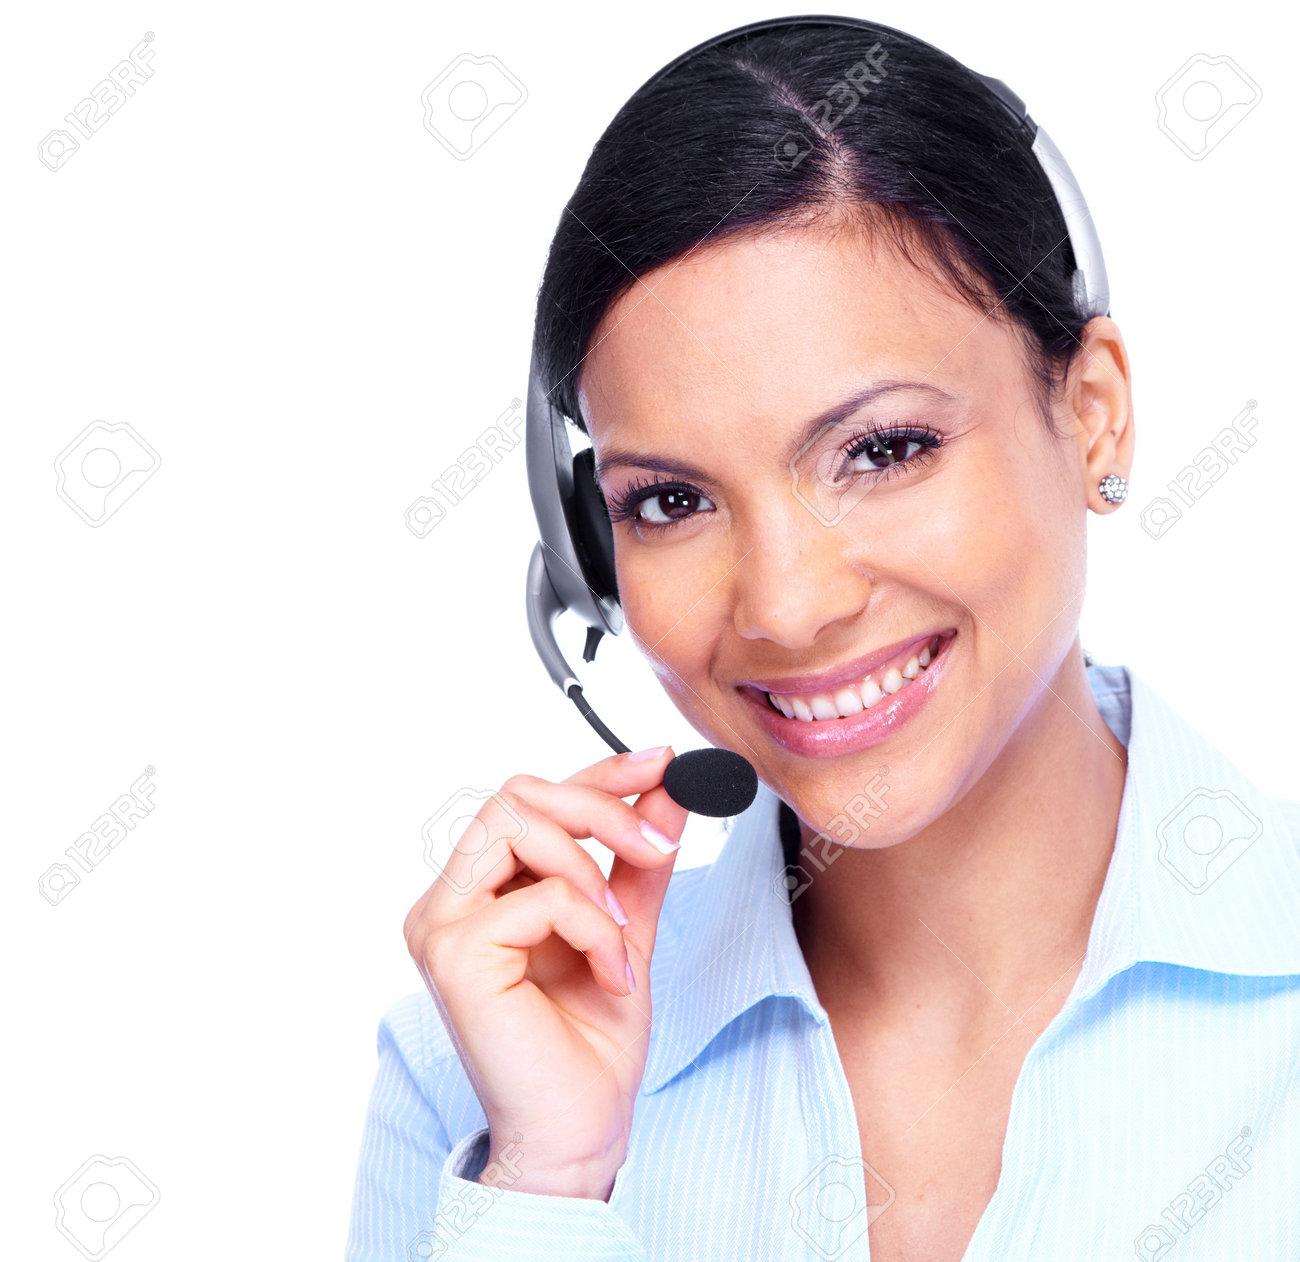 Call center operator business woman Stock Photo - 13929544